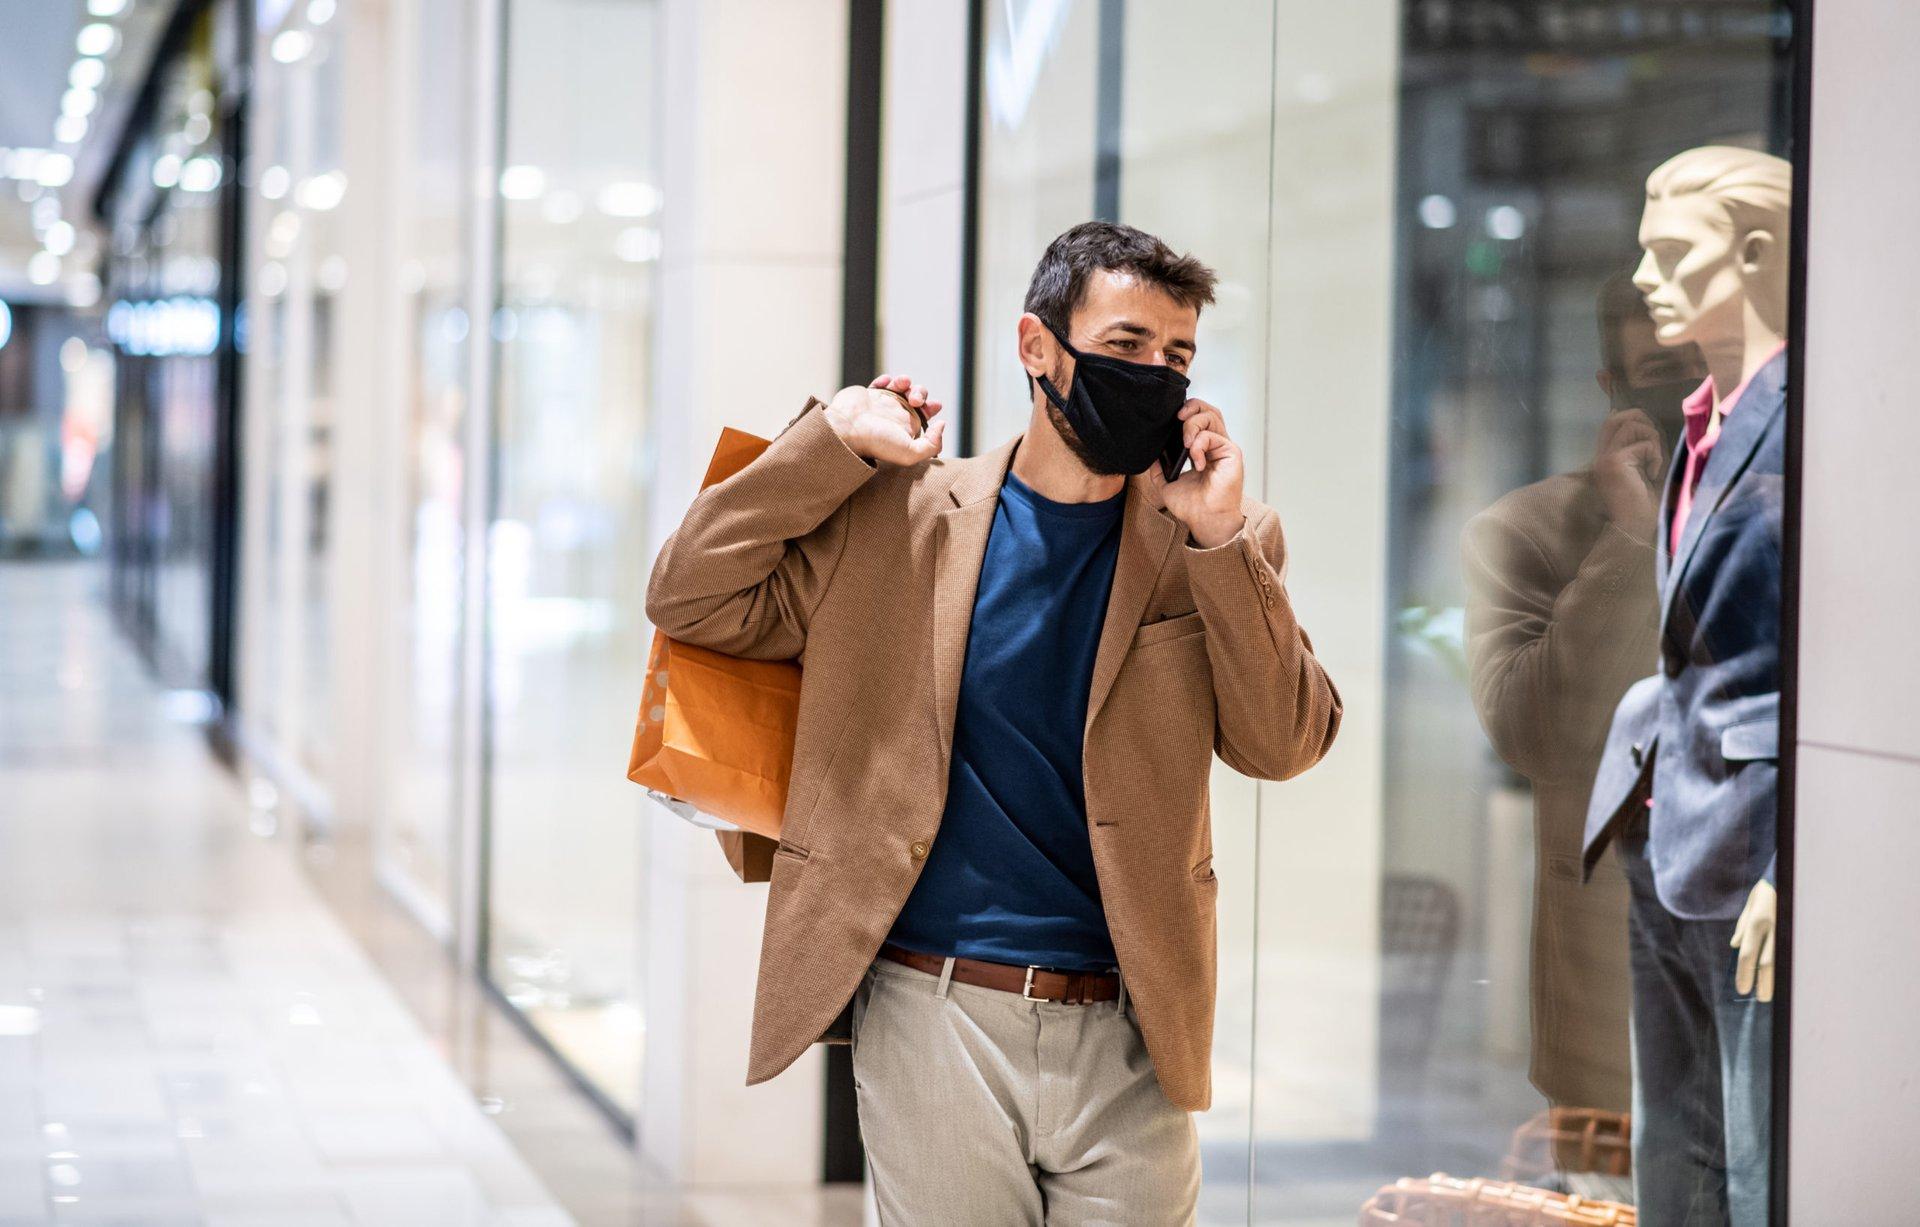 Man avoiding crowds while shopping